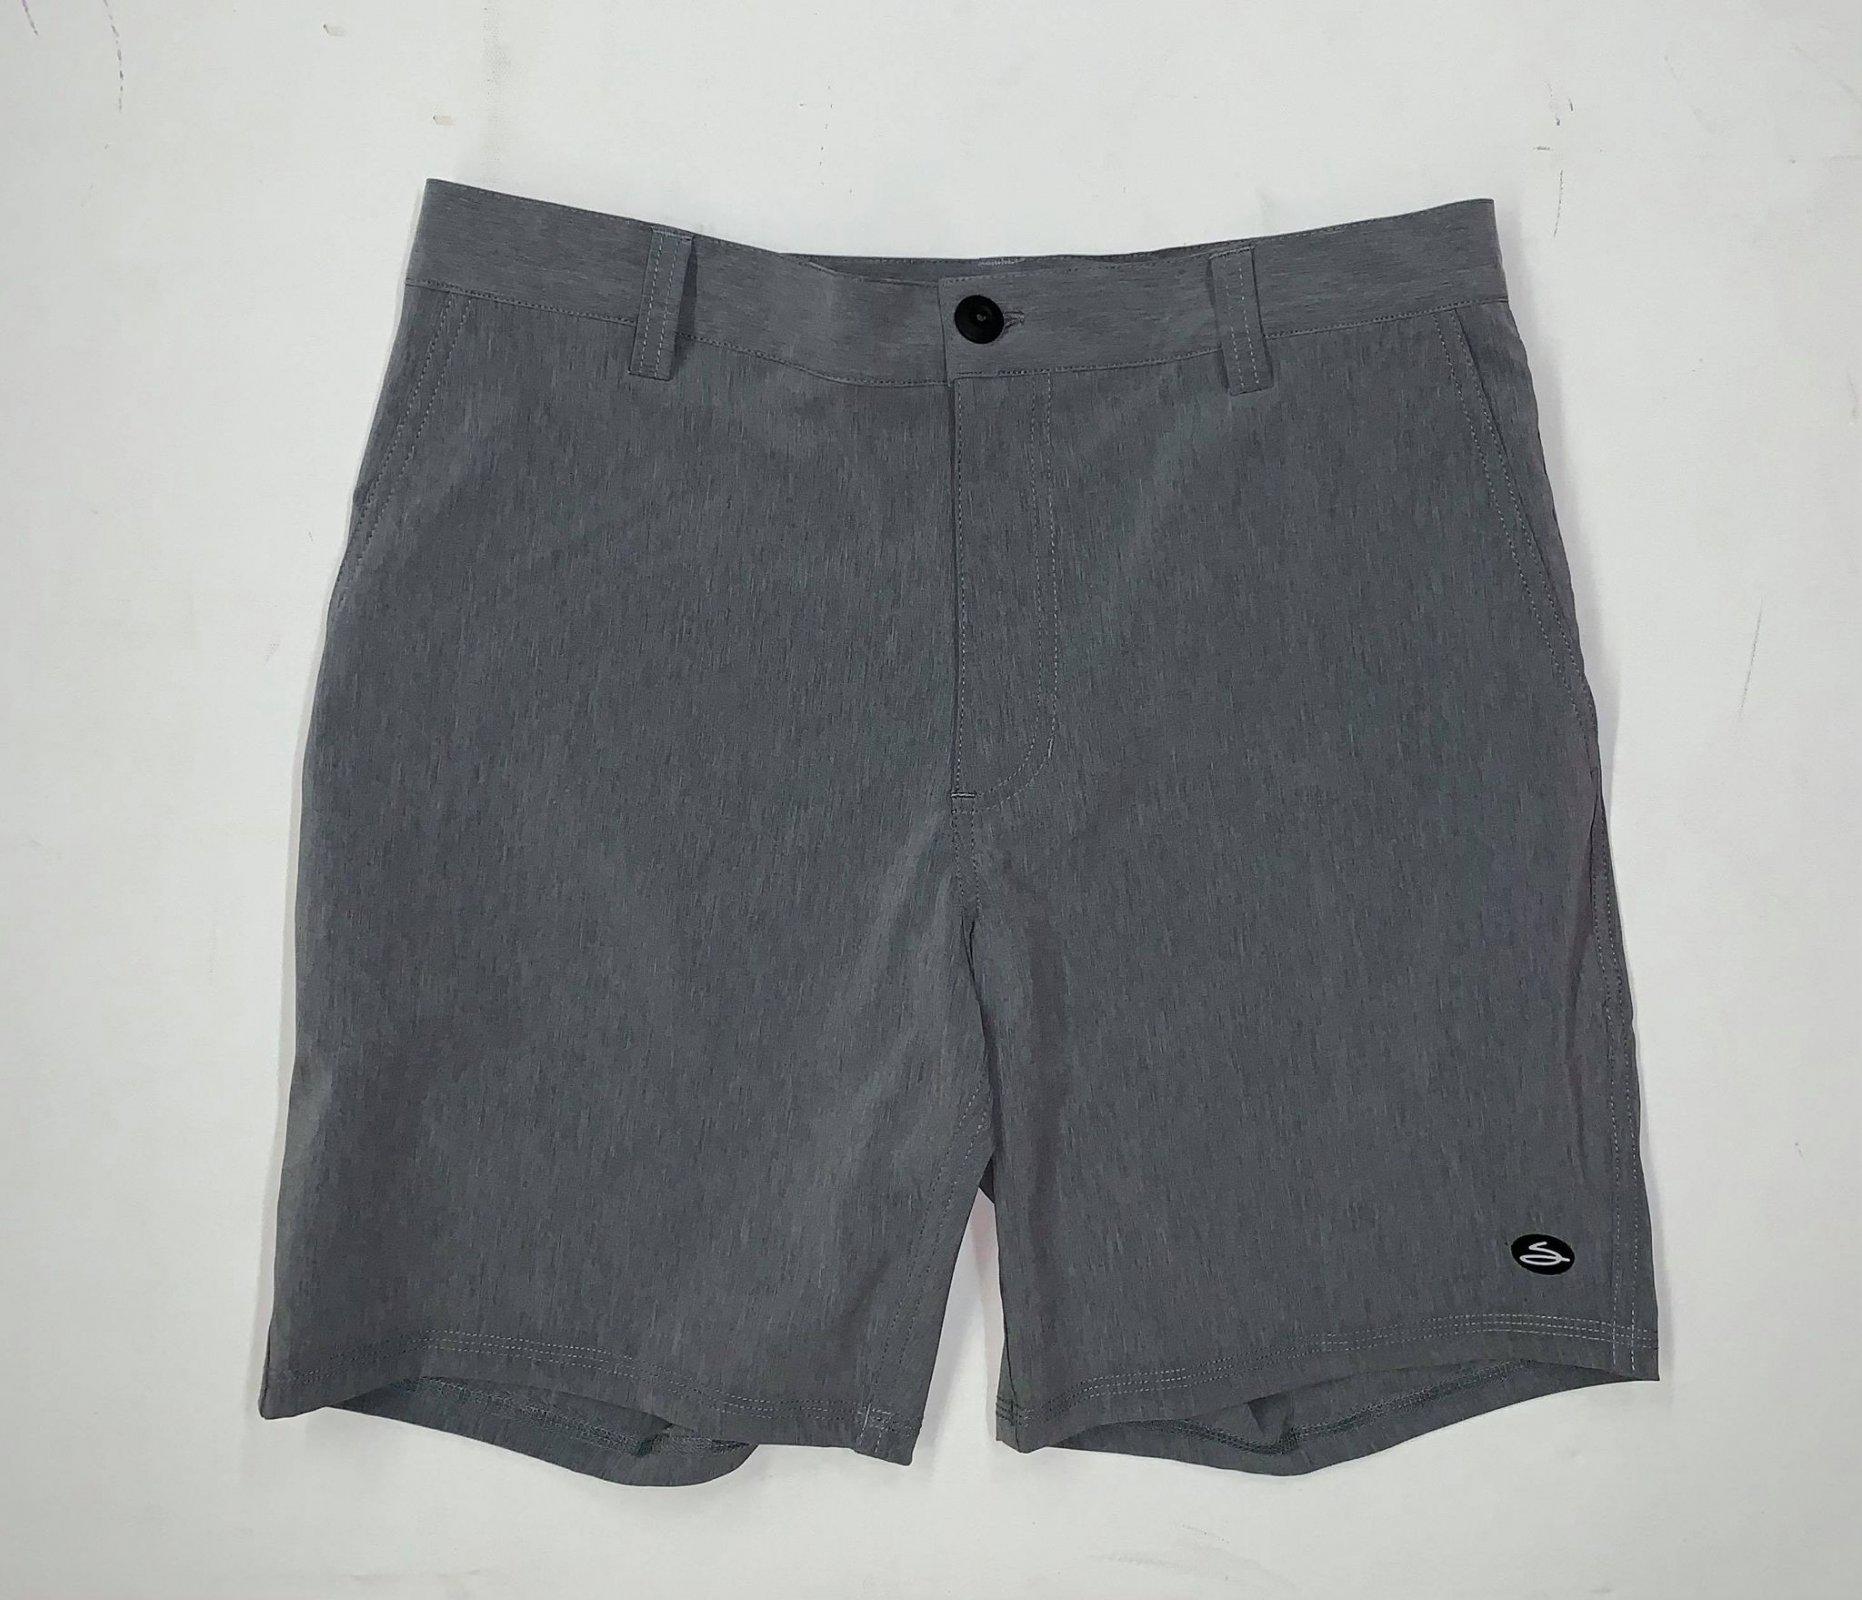 Salty's Brand Men's Elasto 4-Way Stretch Boardshorts - Charcoal